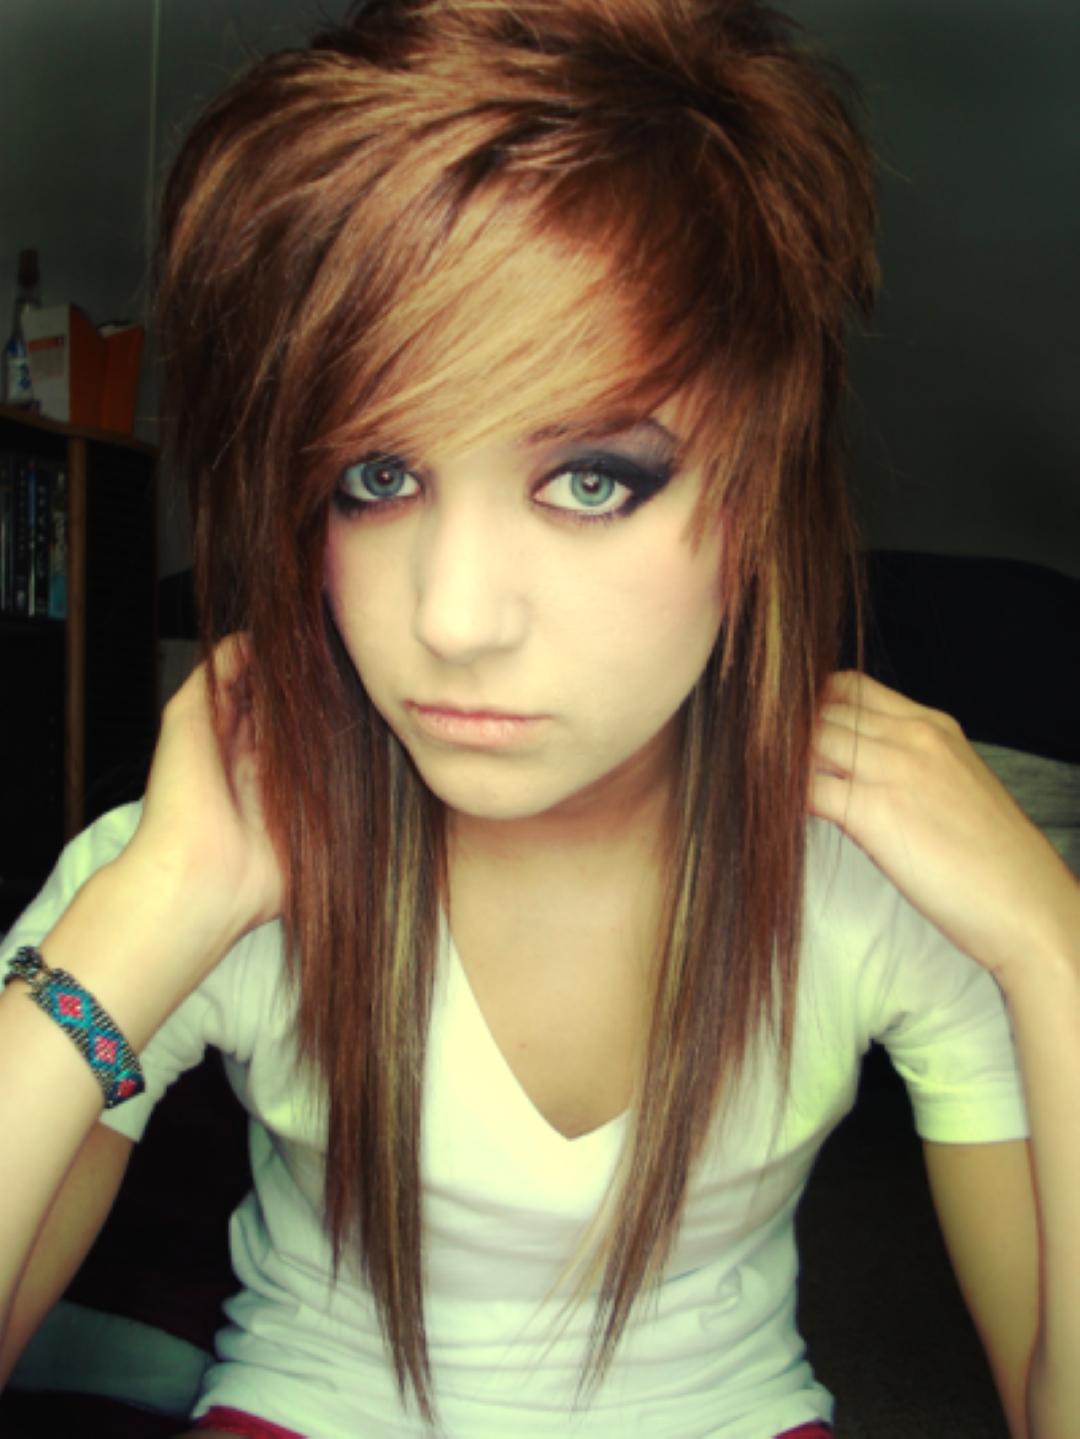 Emo Hairstyles For Girls | Hair Styles | Pinterest | Emo Haircuts intended for Emo Haircuts For Thick Hair Girl